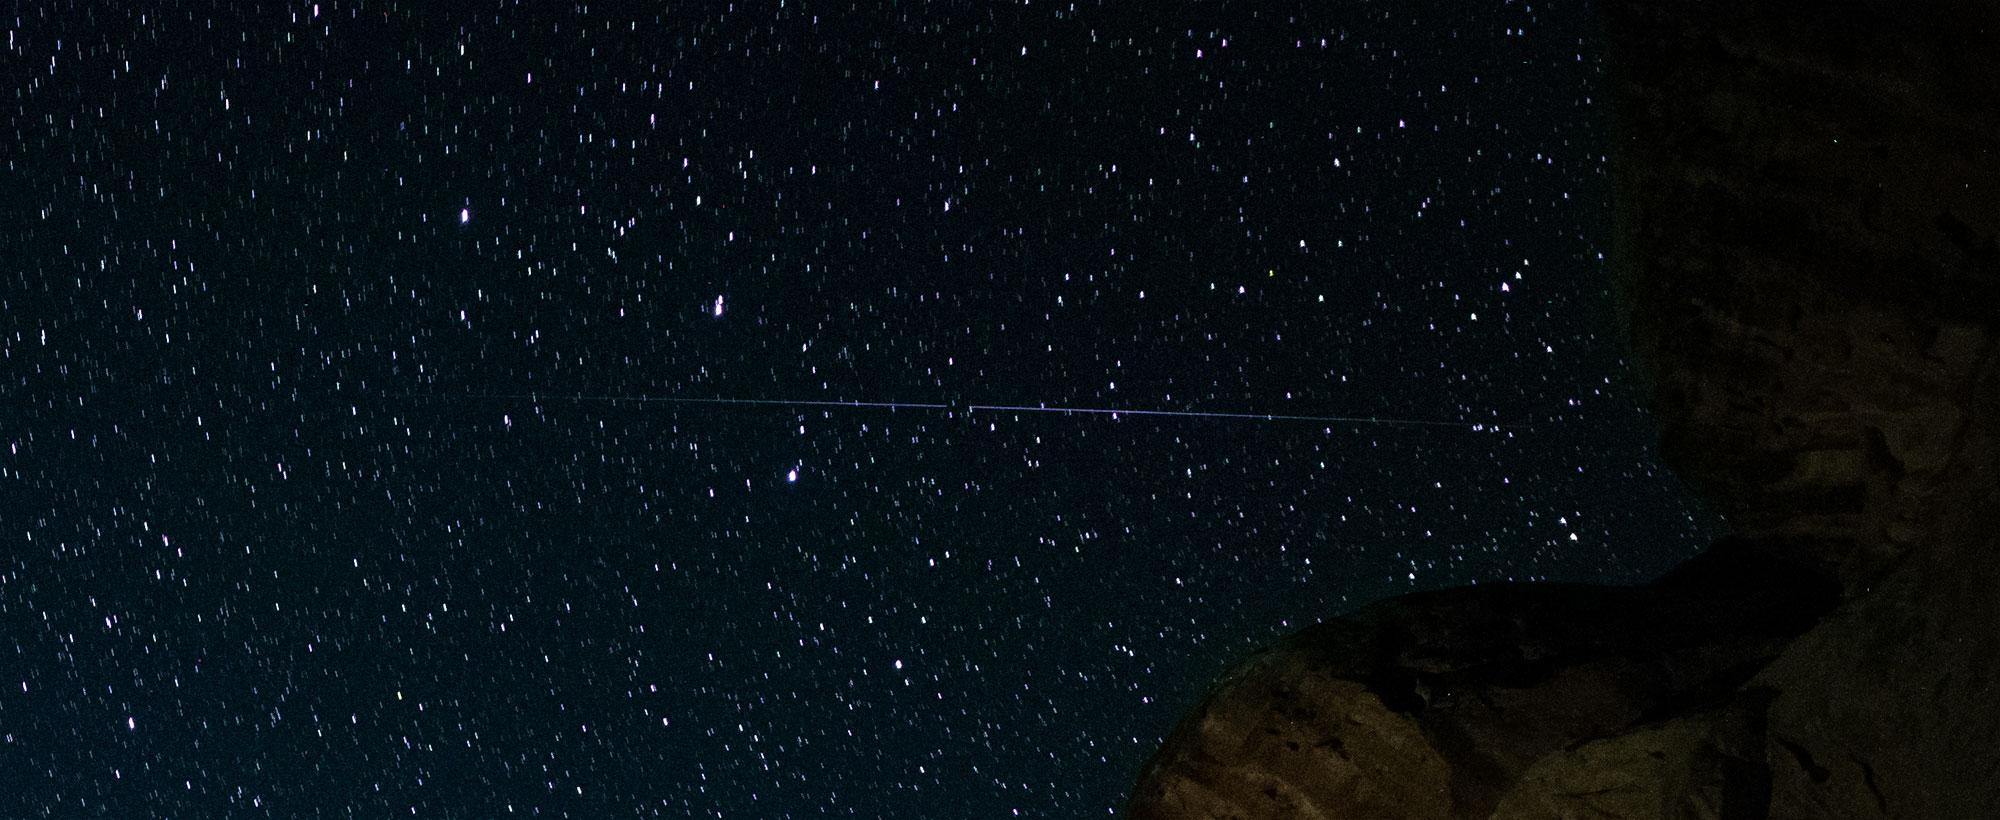 iridium-flare.jpg